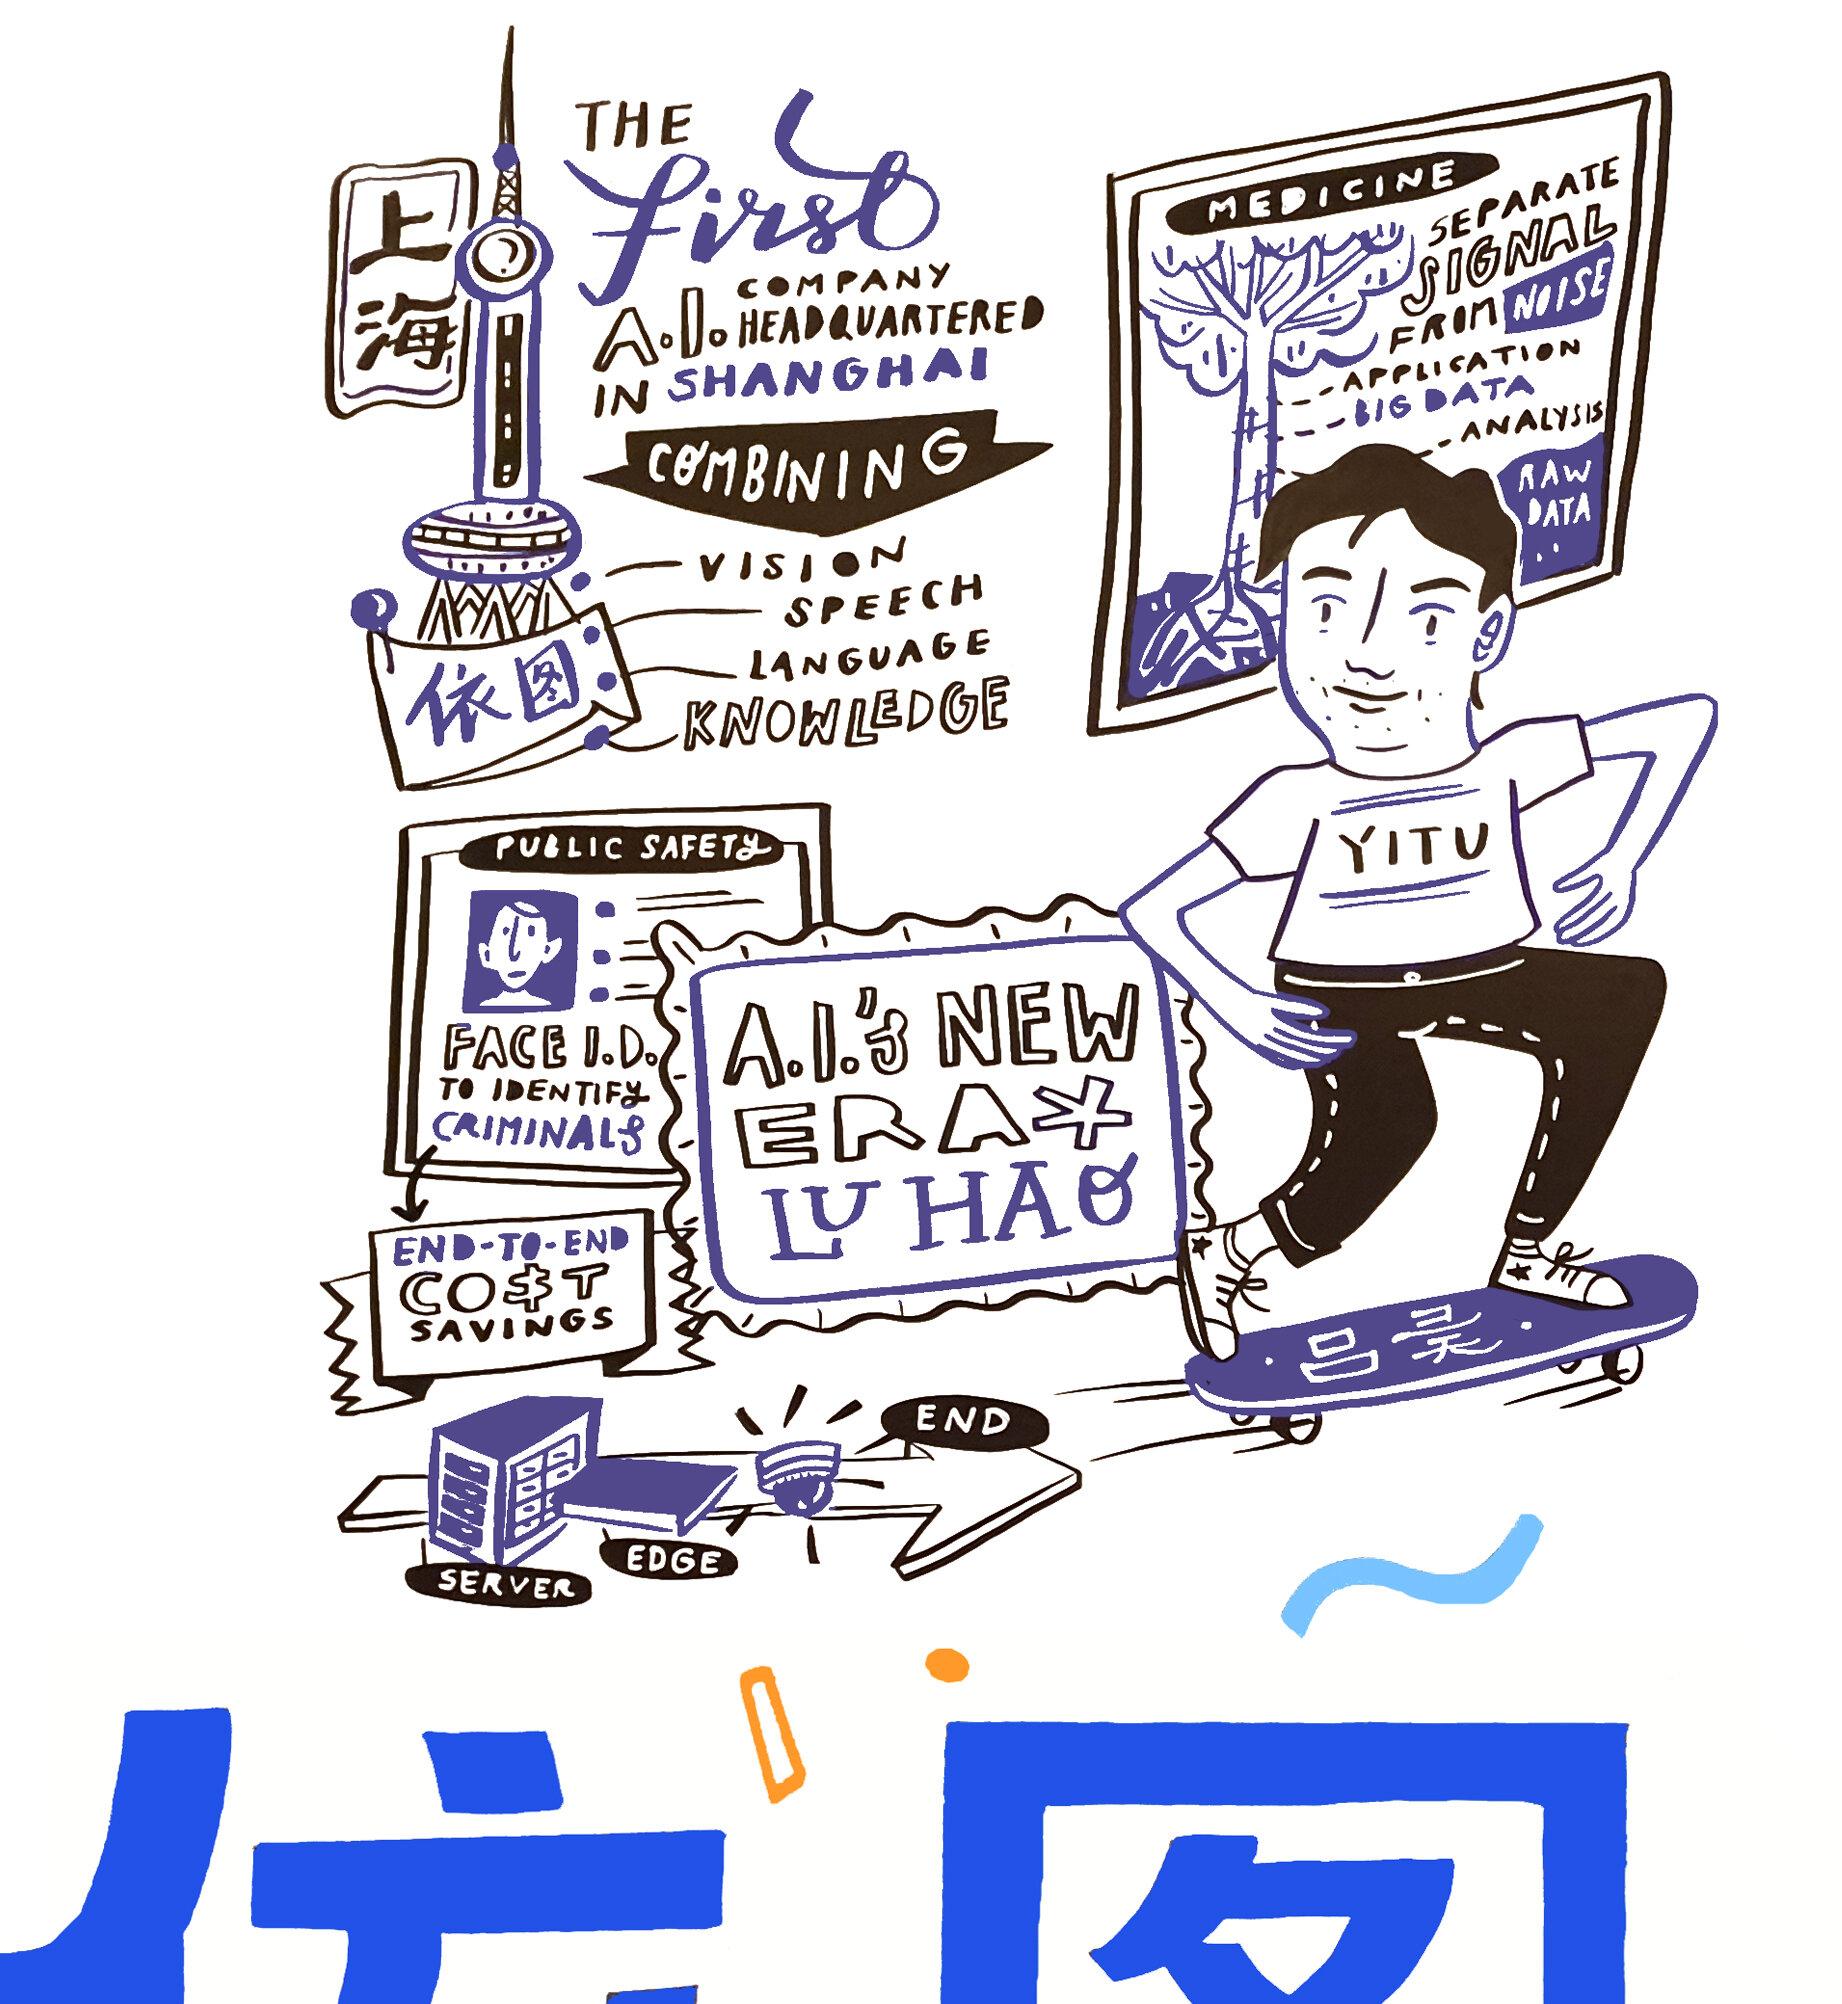 Lu Hao: A.I.'s New Era